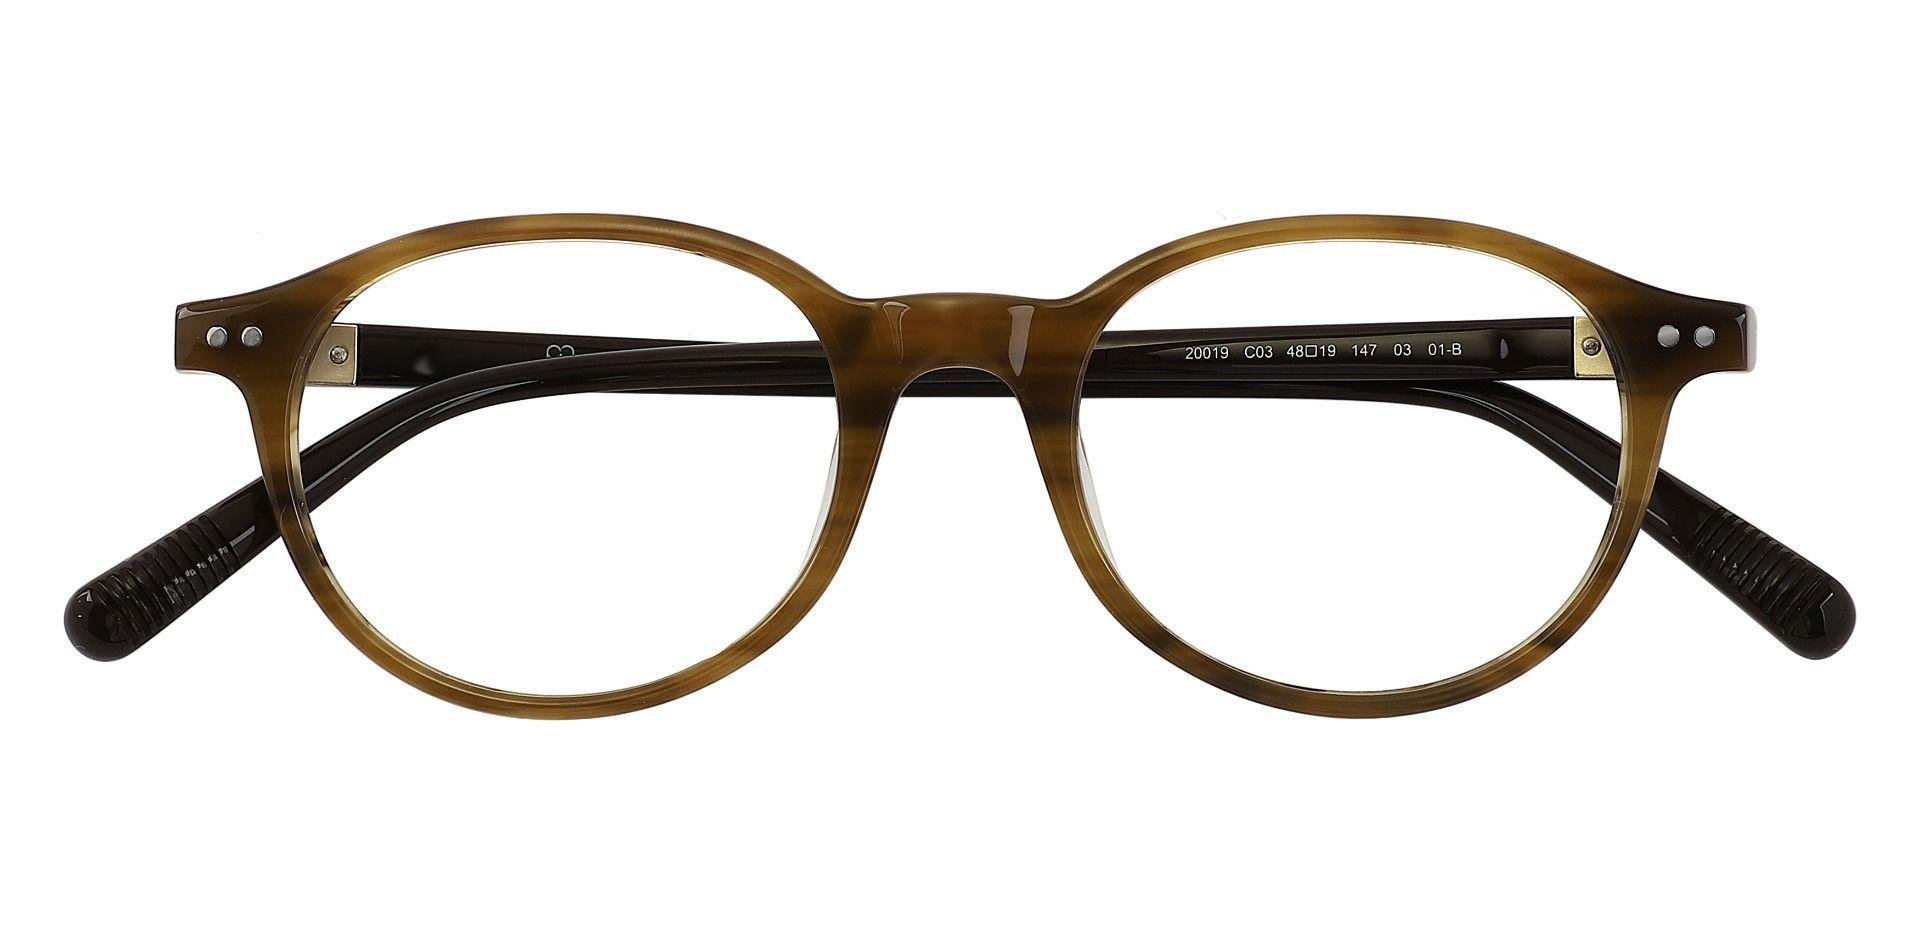 Avon Oval Progressive Glasses - Brown